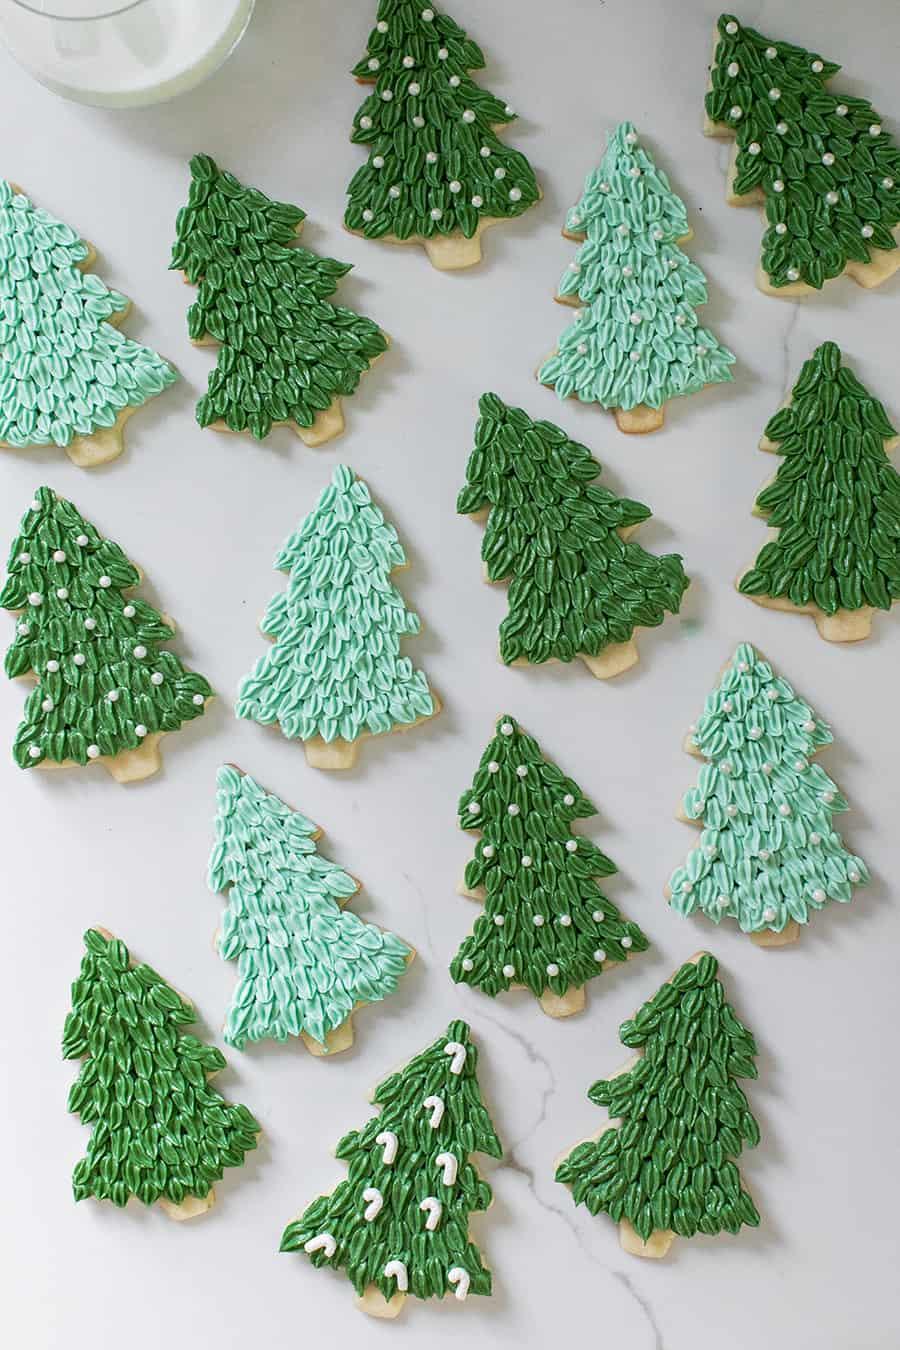 Christmas tree sugar cookies on a  marble table.